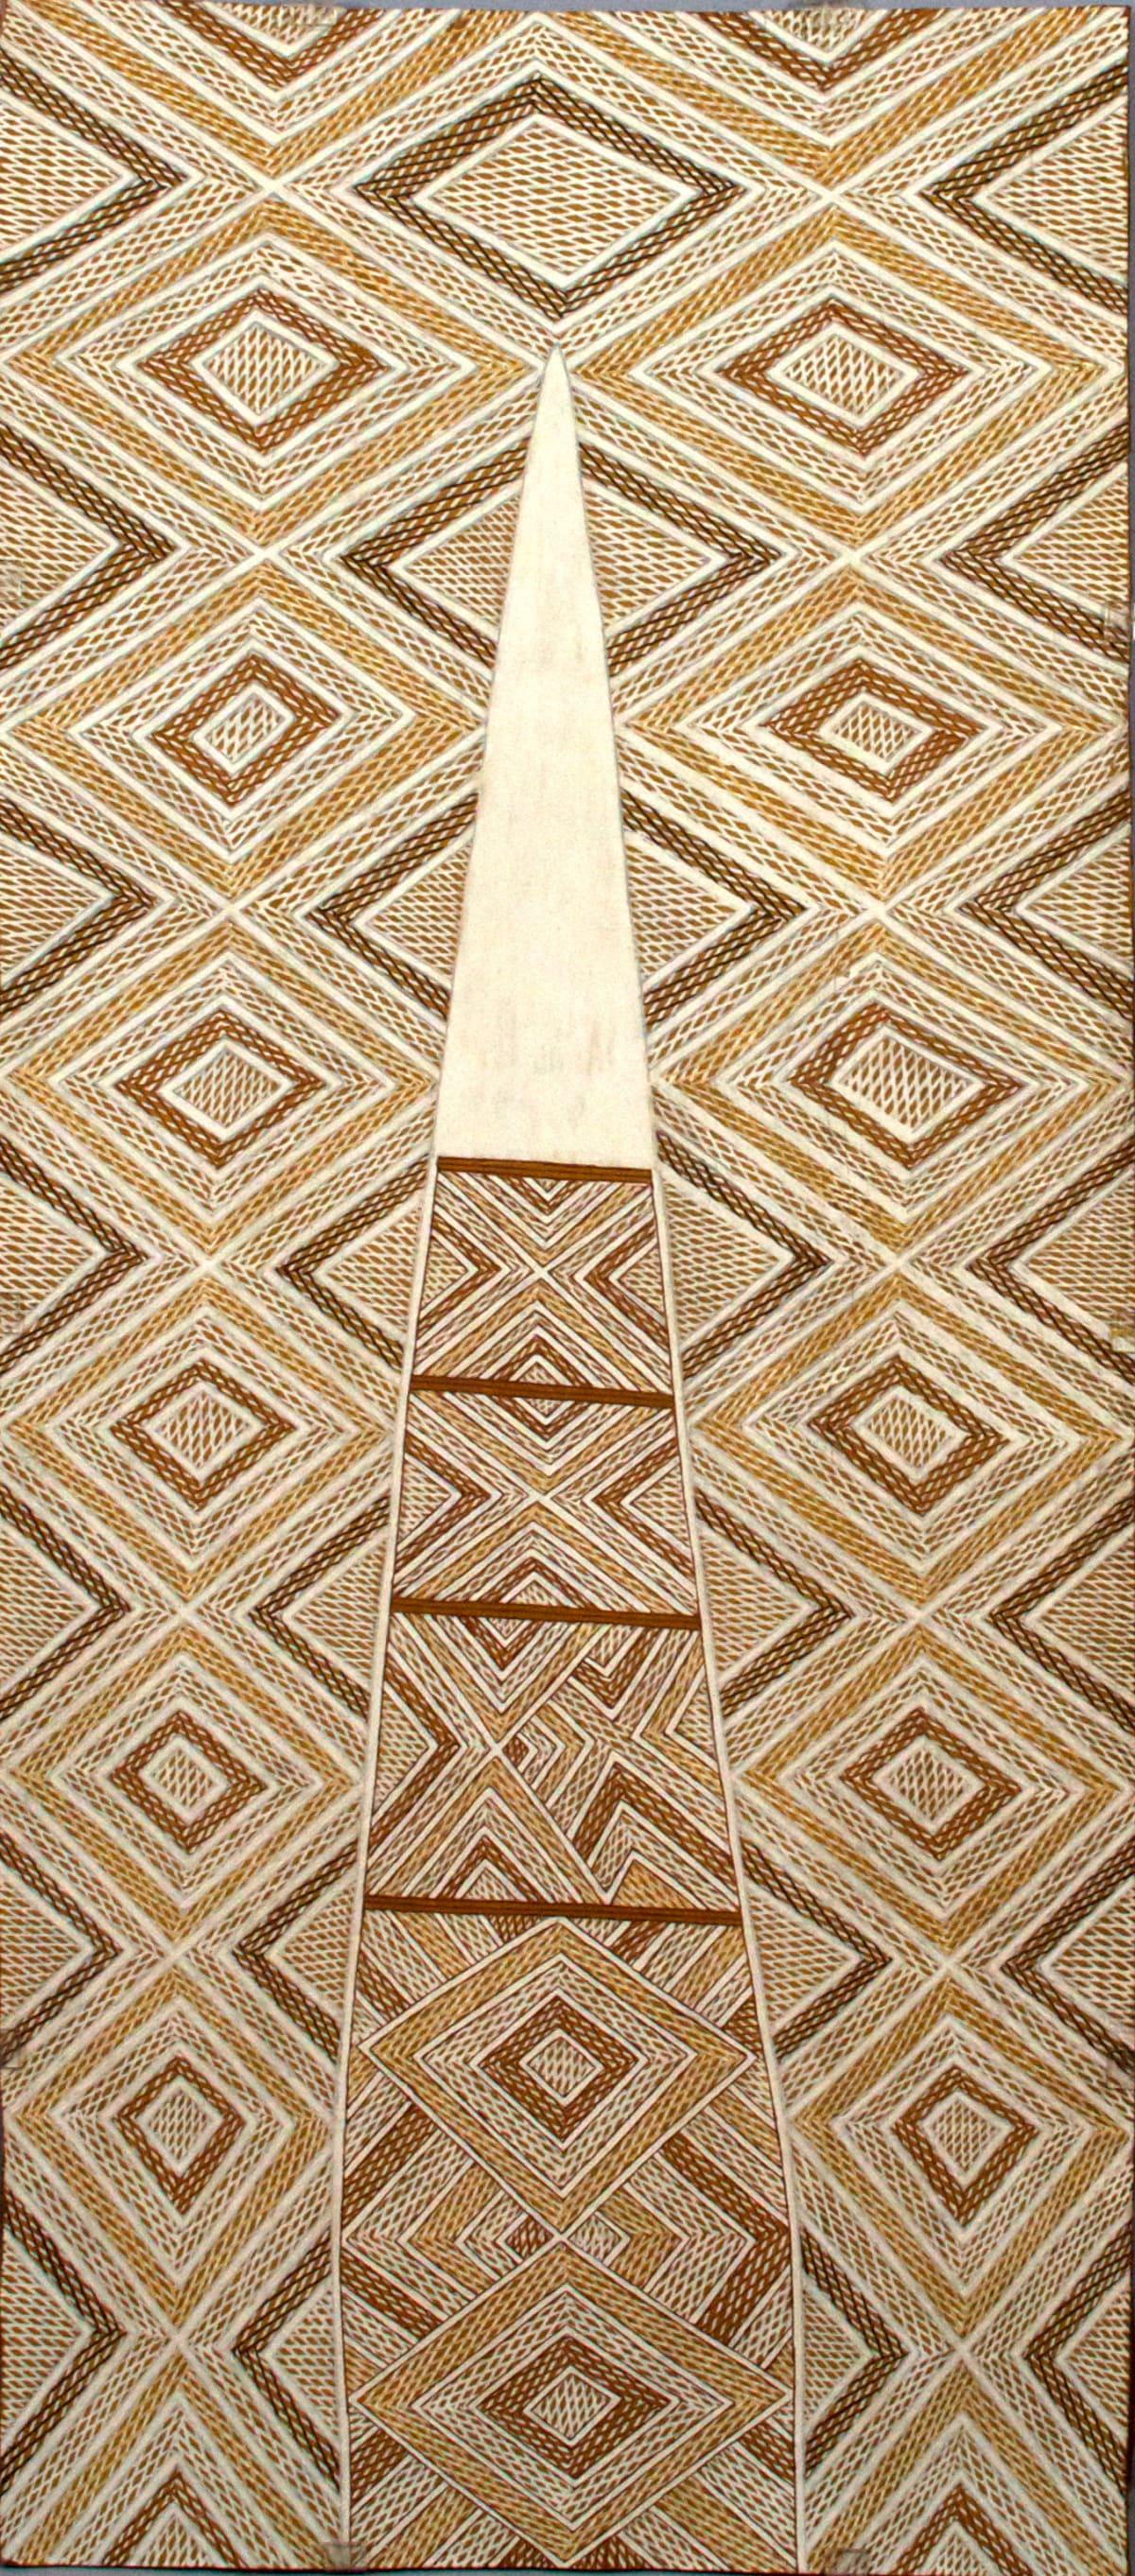 Garawan Wanambi Marranu at Raymangirr natural earth pigment on bark 104 x 46 cm